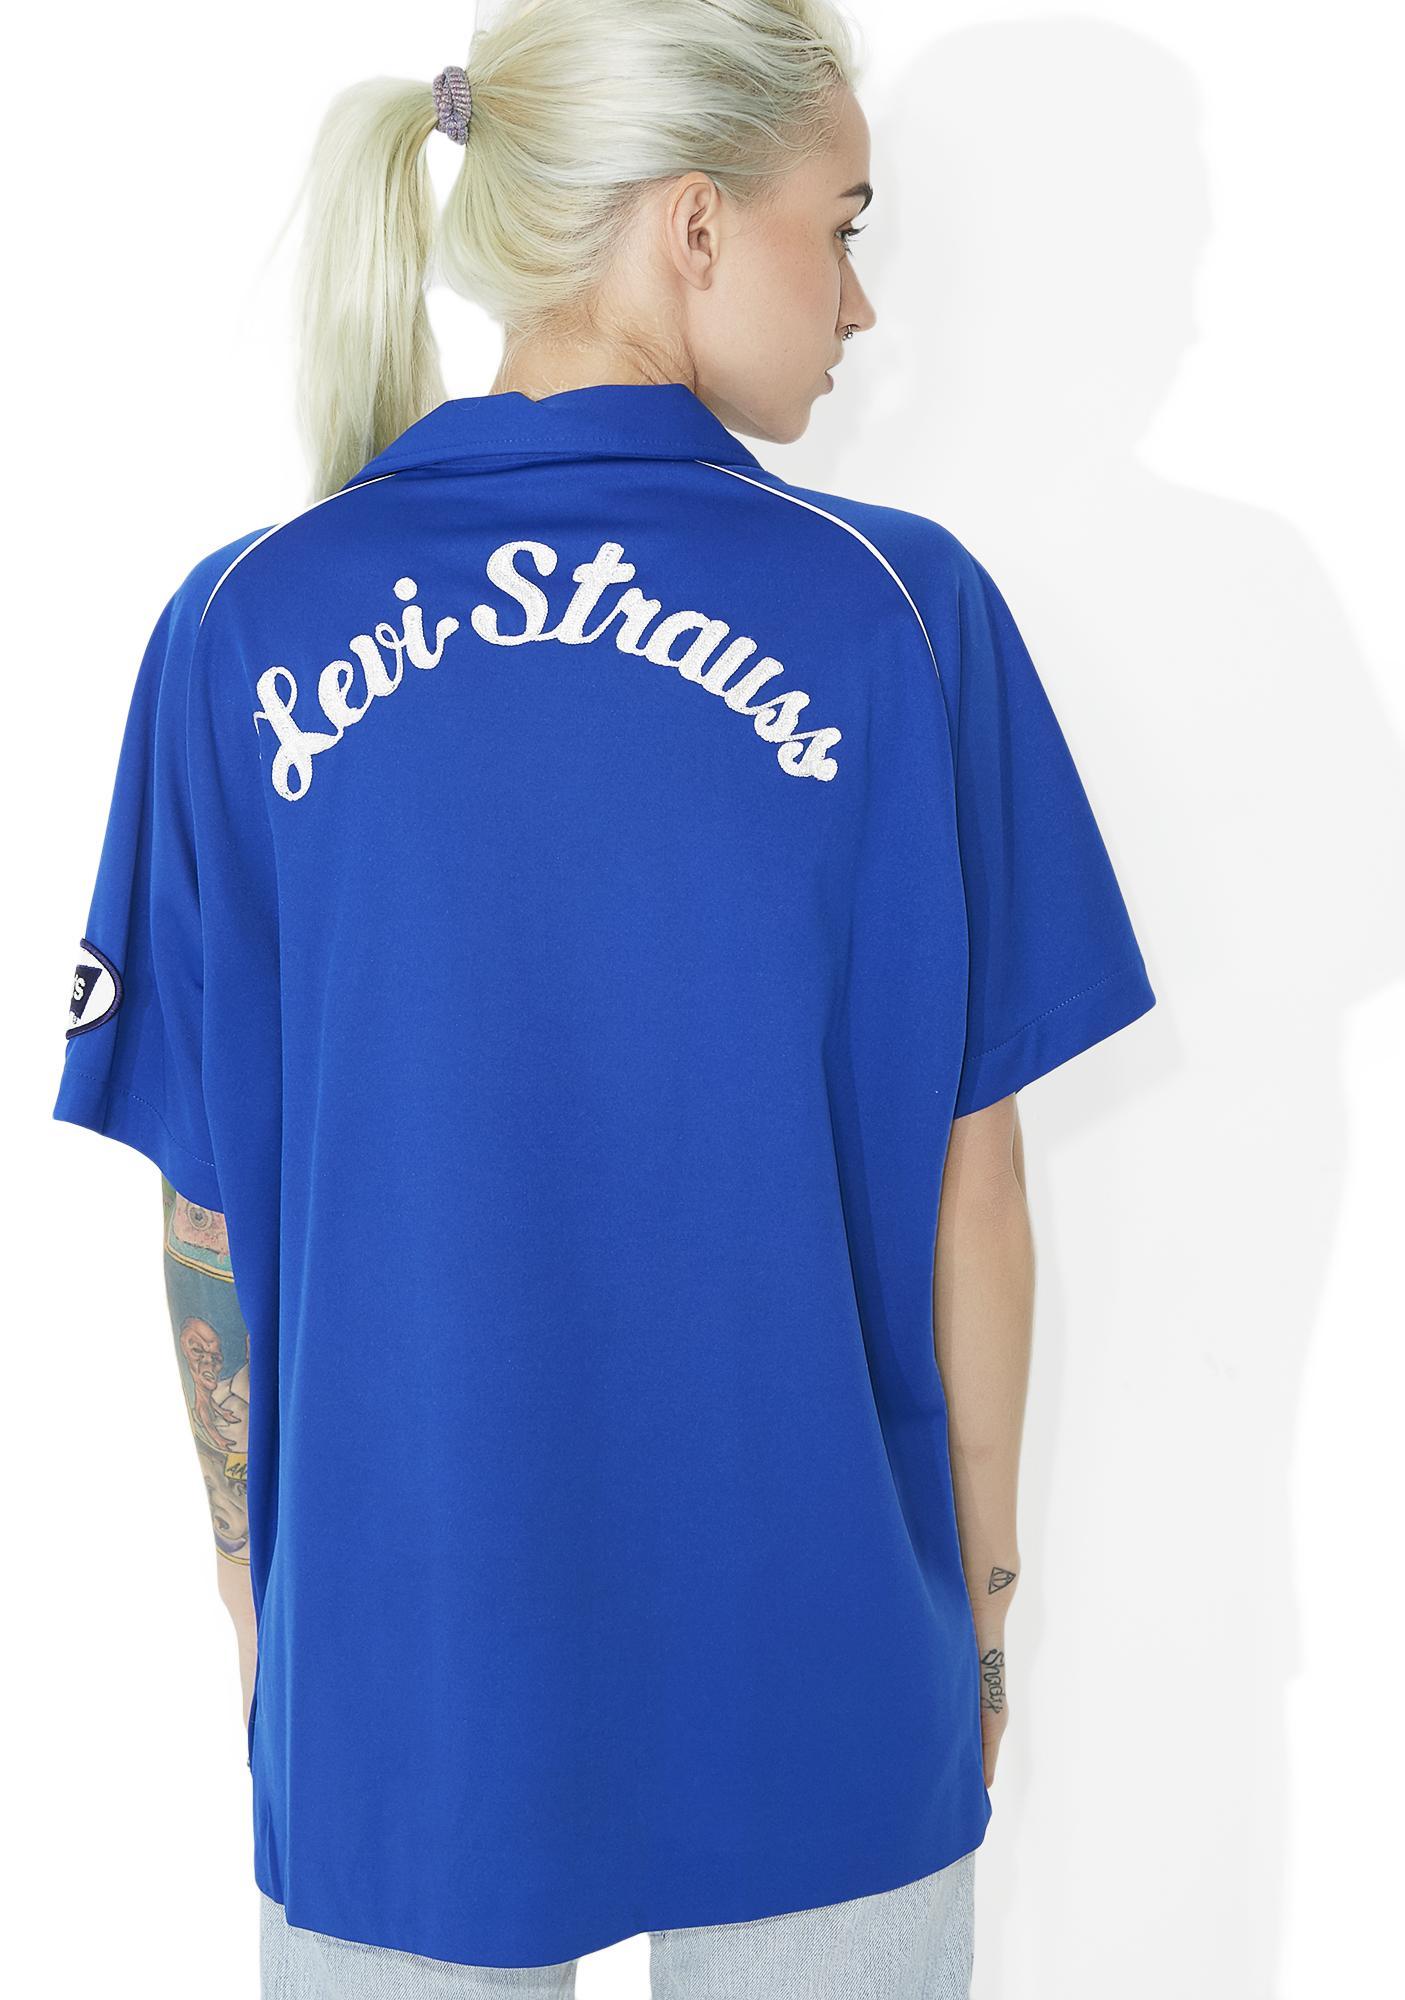 Vintage Levi Strauss A-Team Jersey